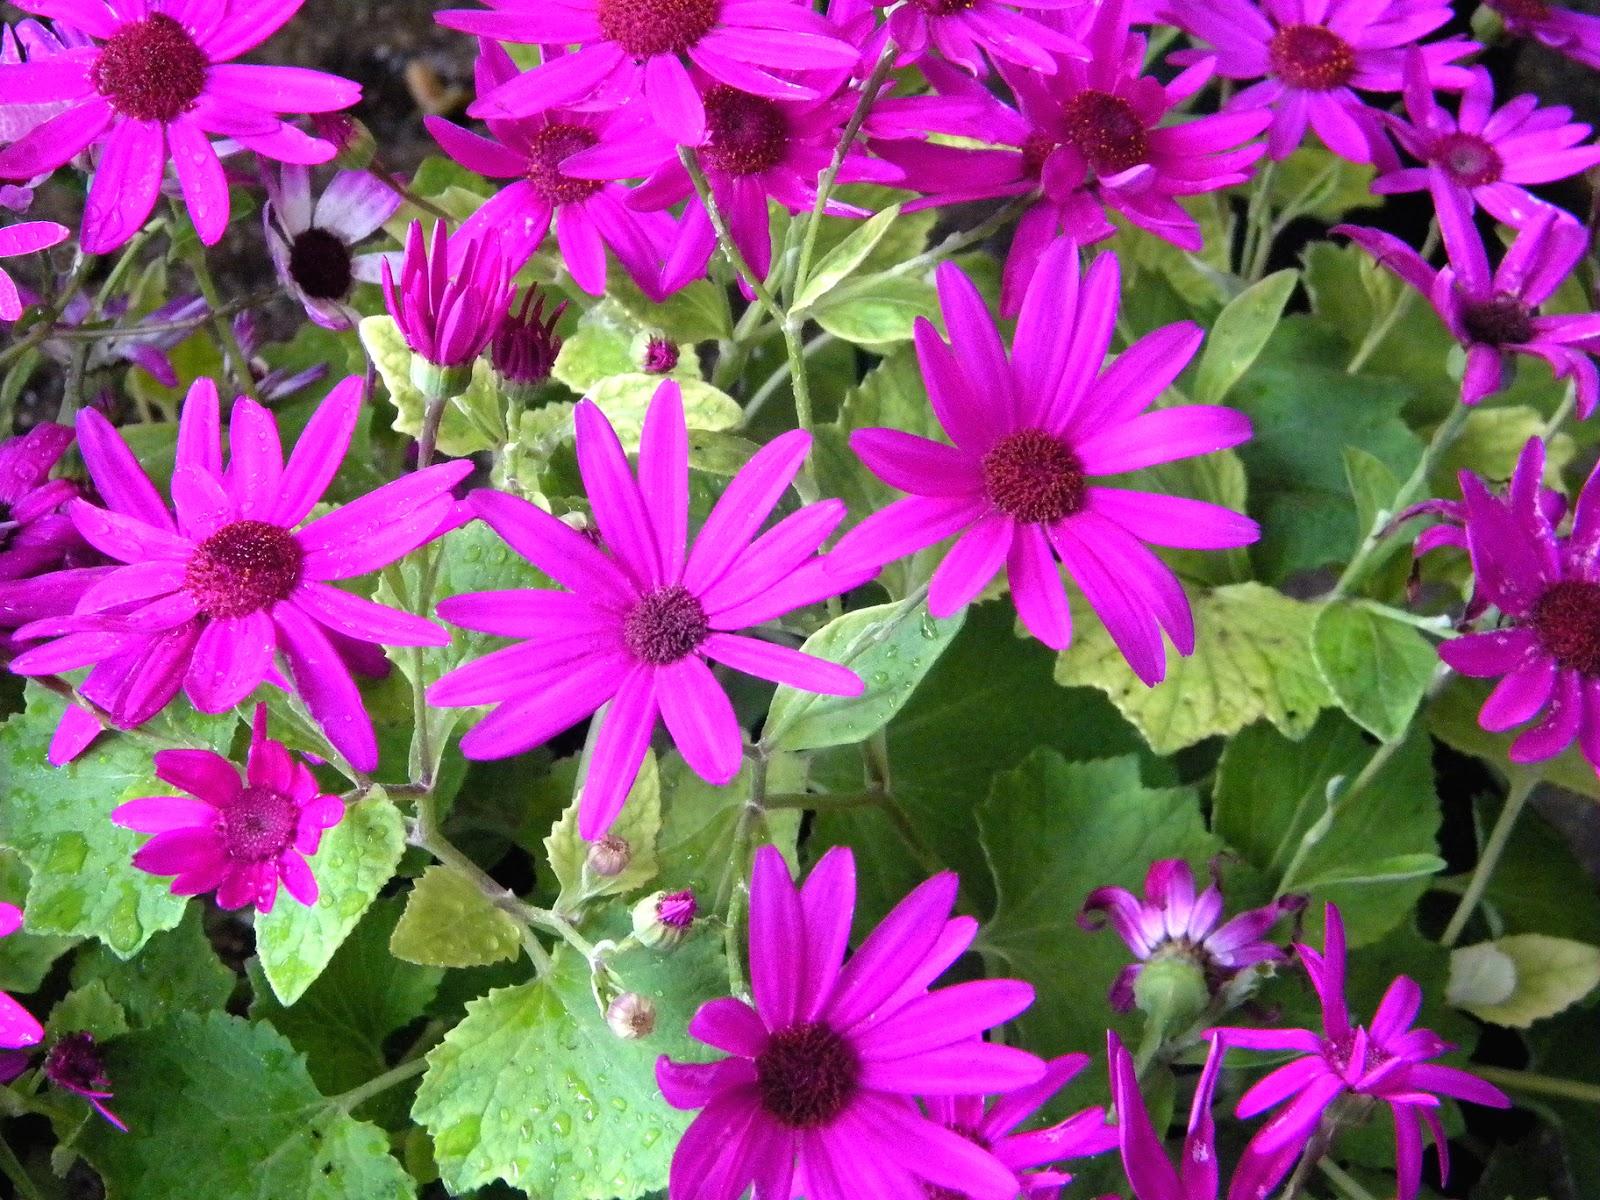 Fuchsia Daisies spring flowers Cape daisy